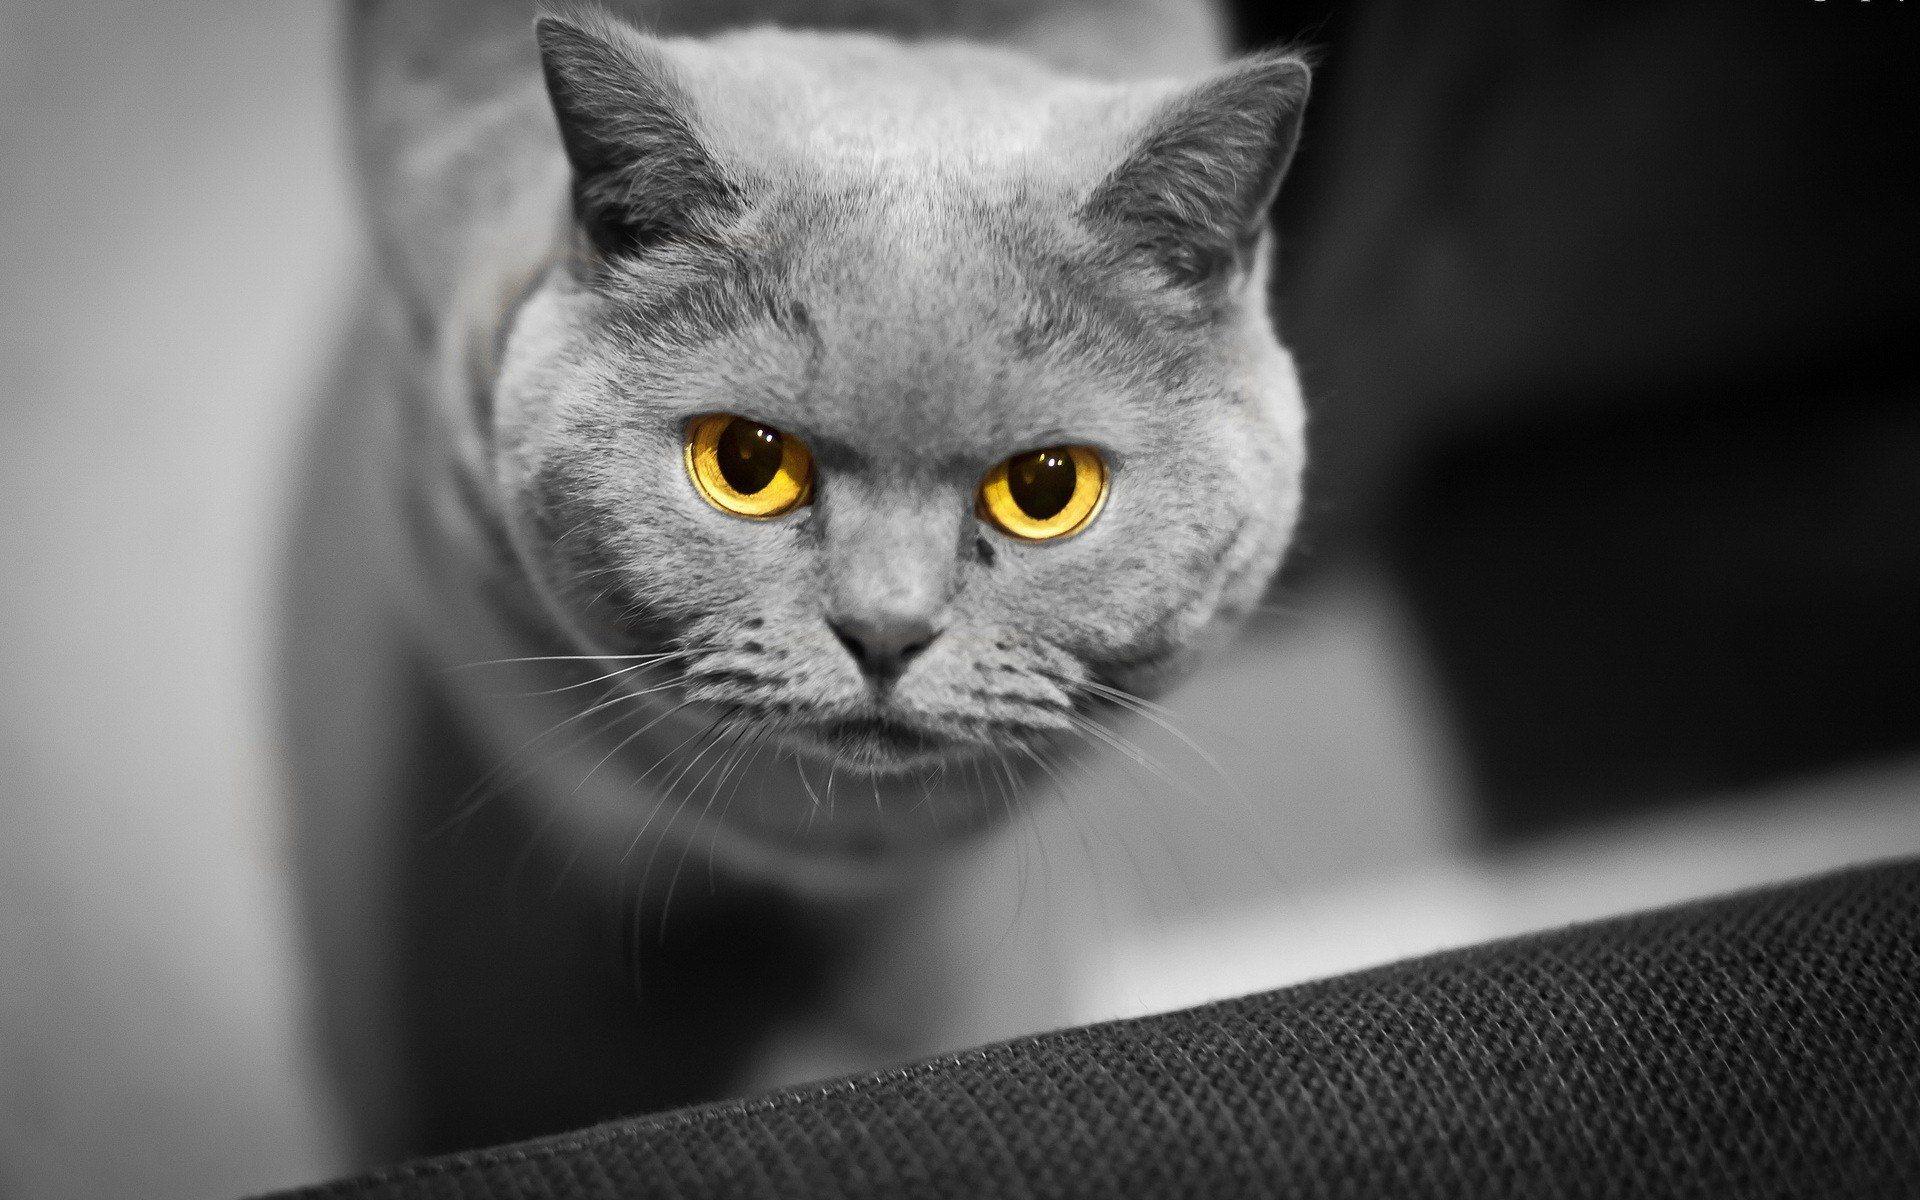 yellow eyes cat wallpaper background